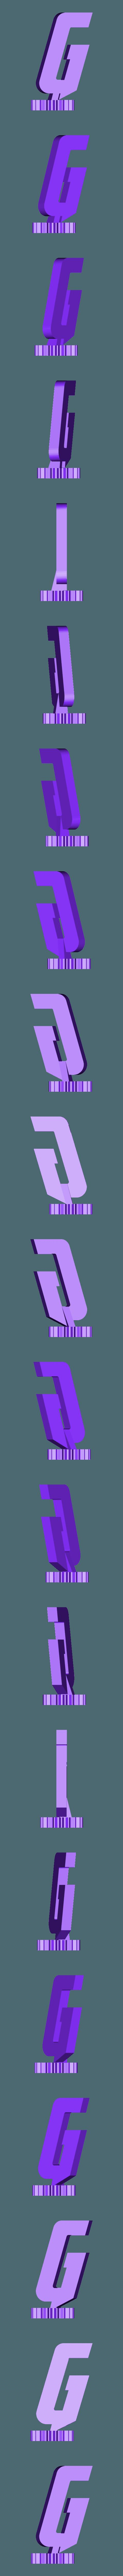 G, Avengers Logo.STL Download free STL file Avengers Rotating Logo • 3D printing template, potentprintables